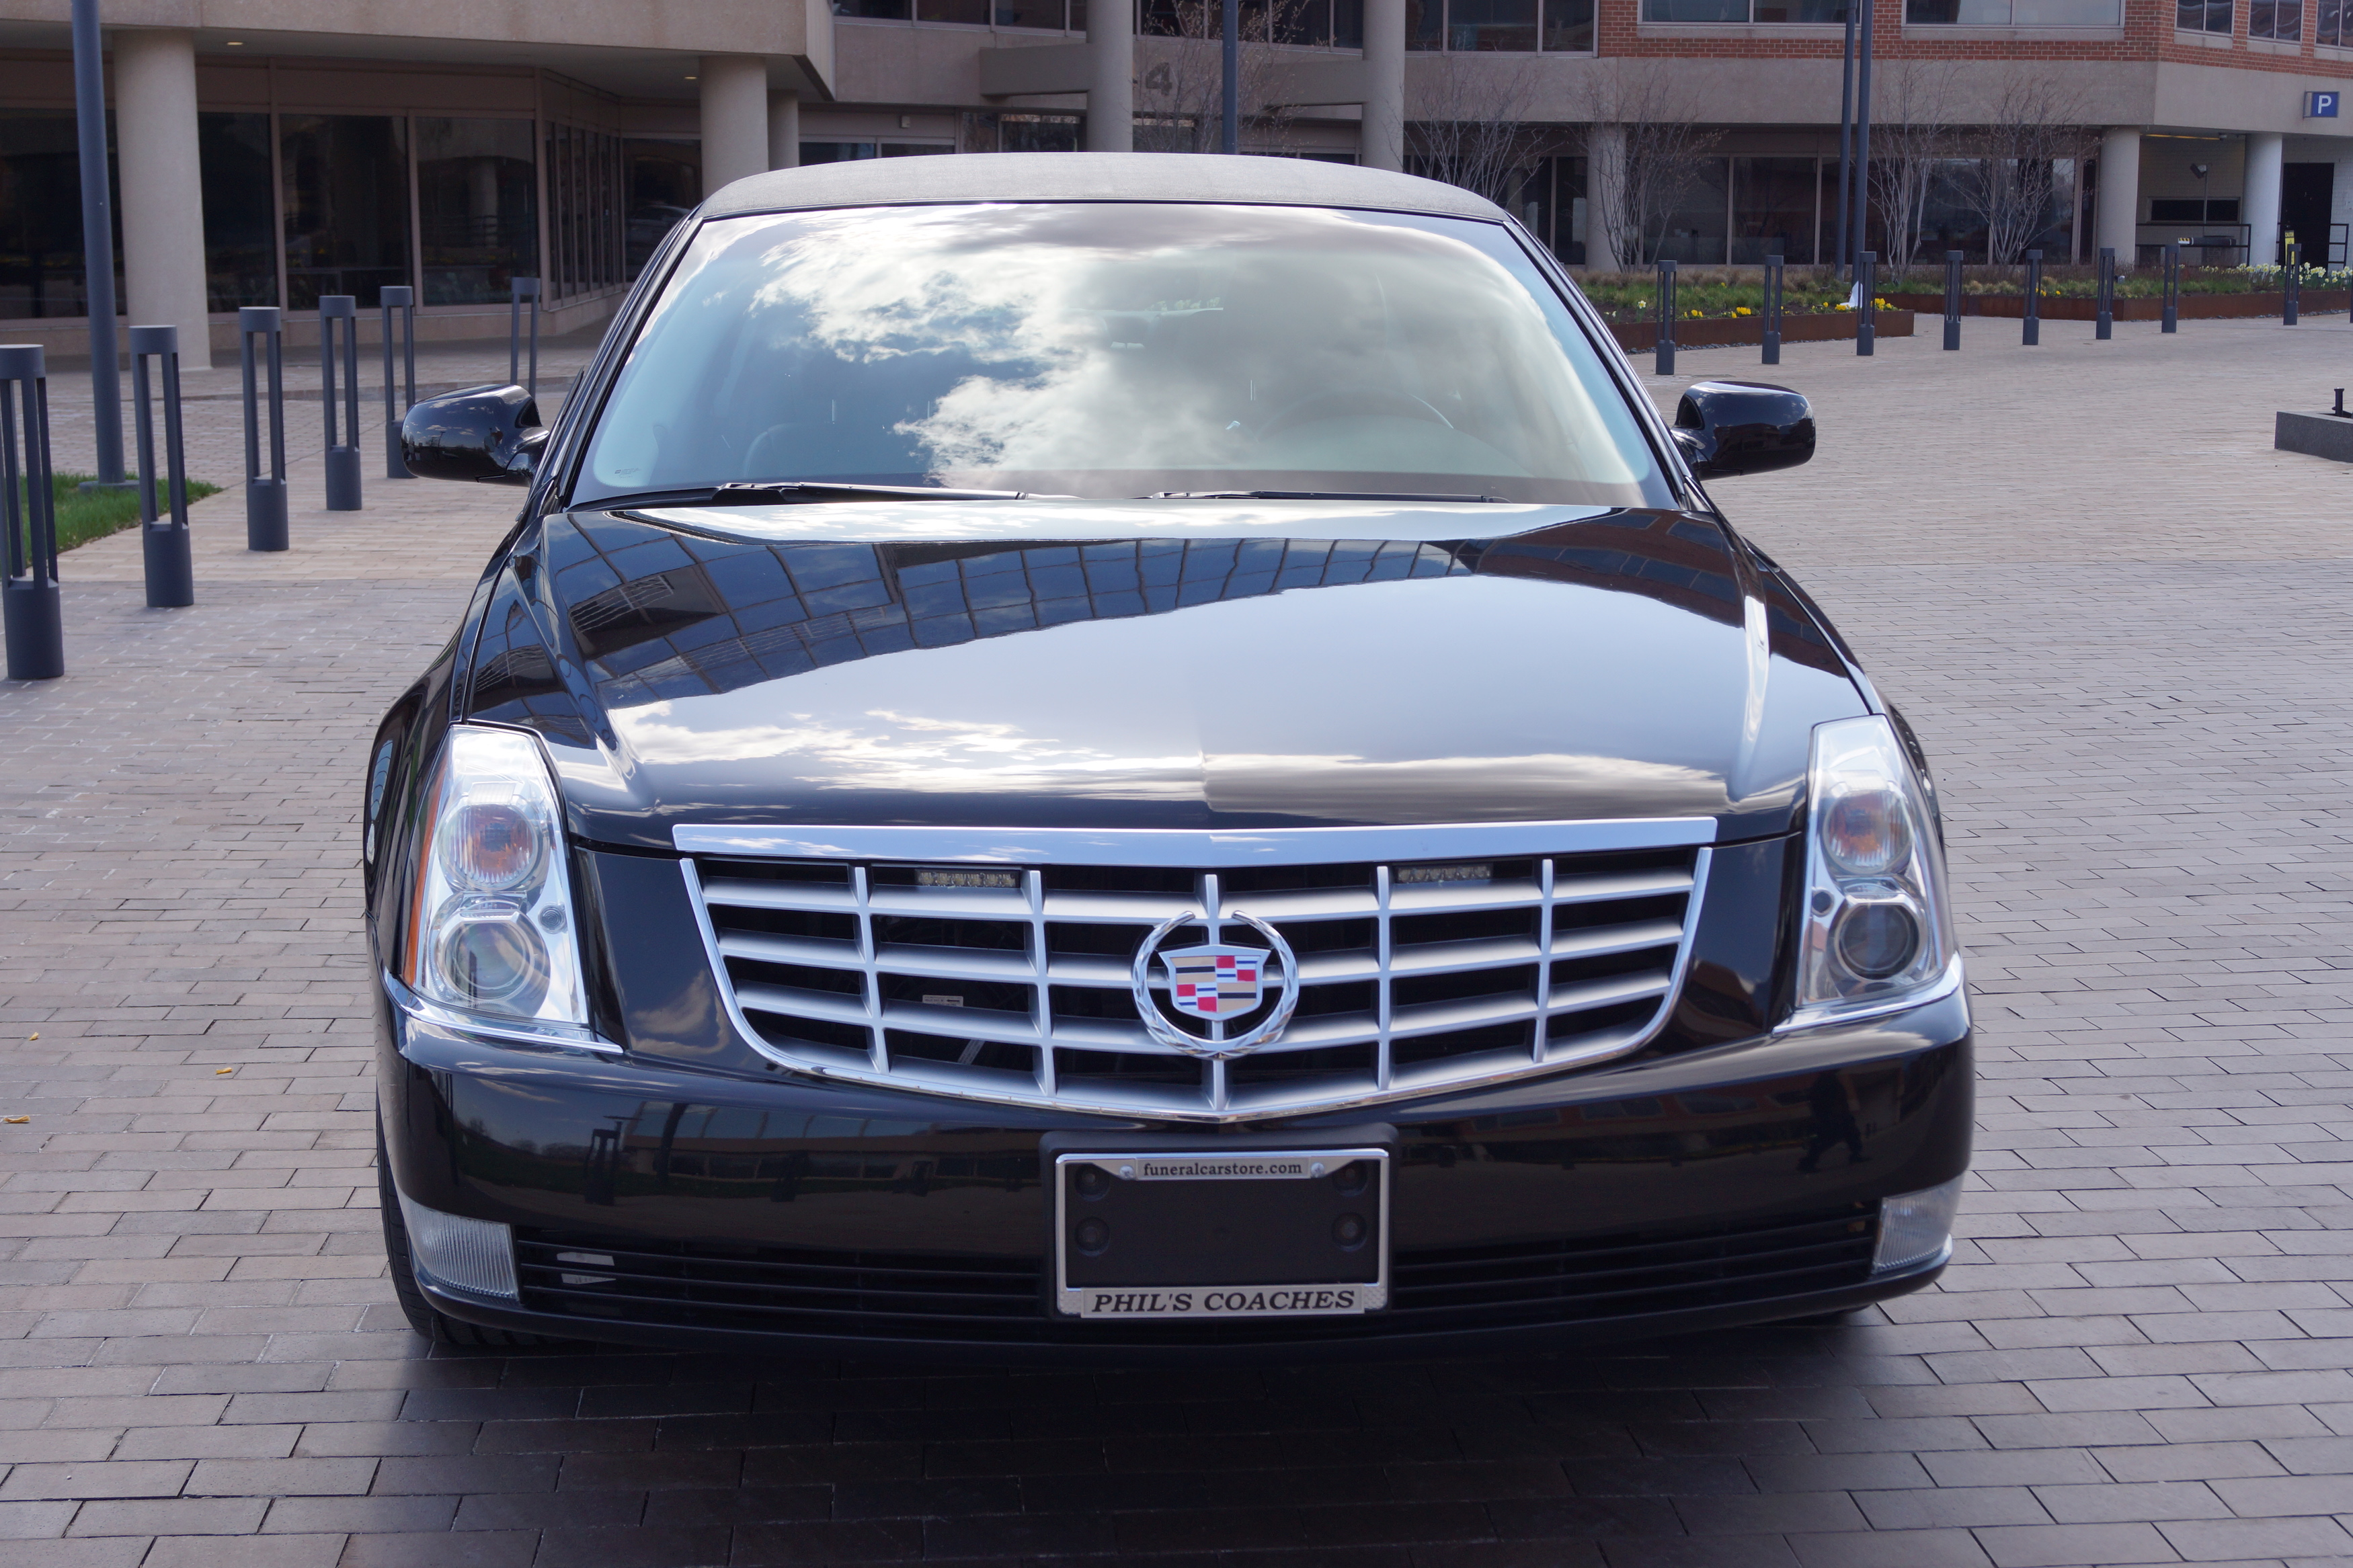 auto at dts used usa base cadillac house saugus cars